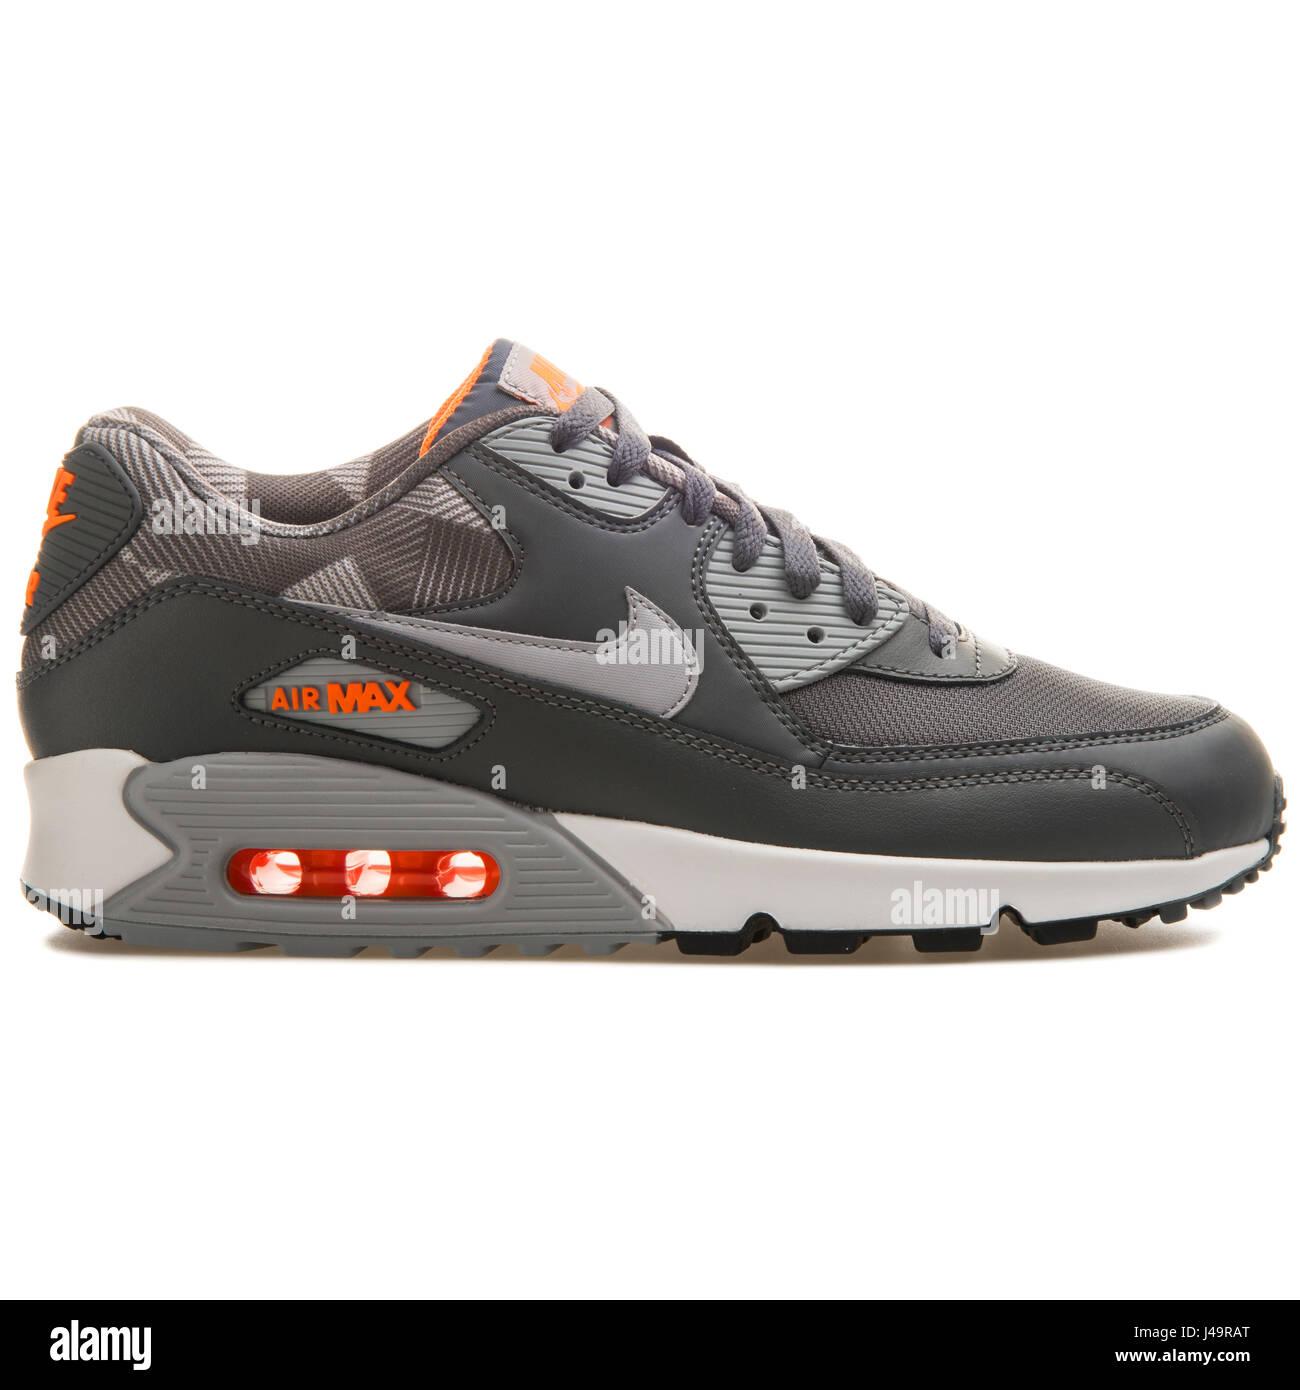 8f05485c Nike Air Max 90 Print Dark Grey White - 749817-018 Stock Photo ...